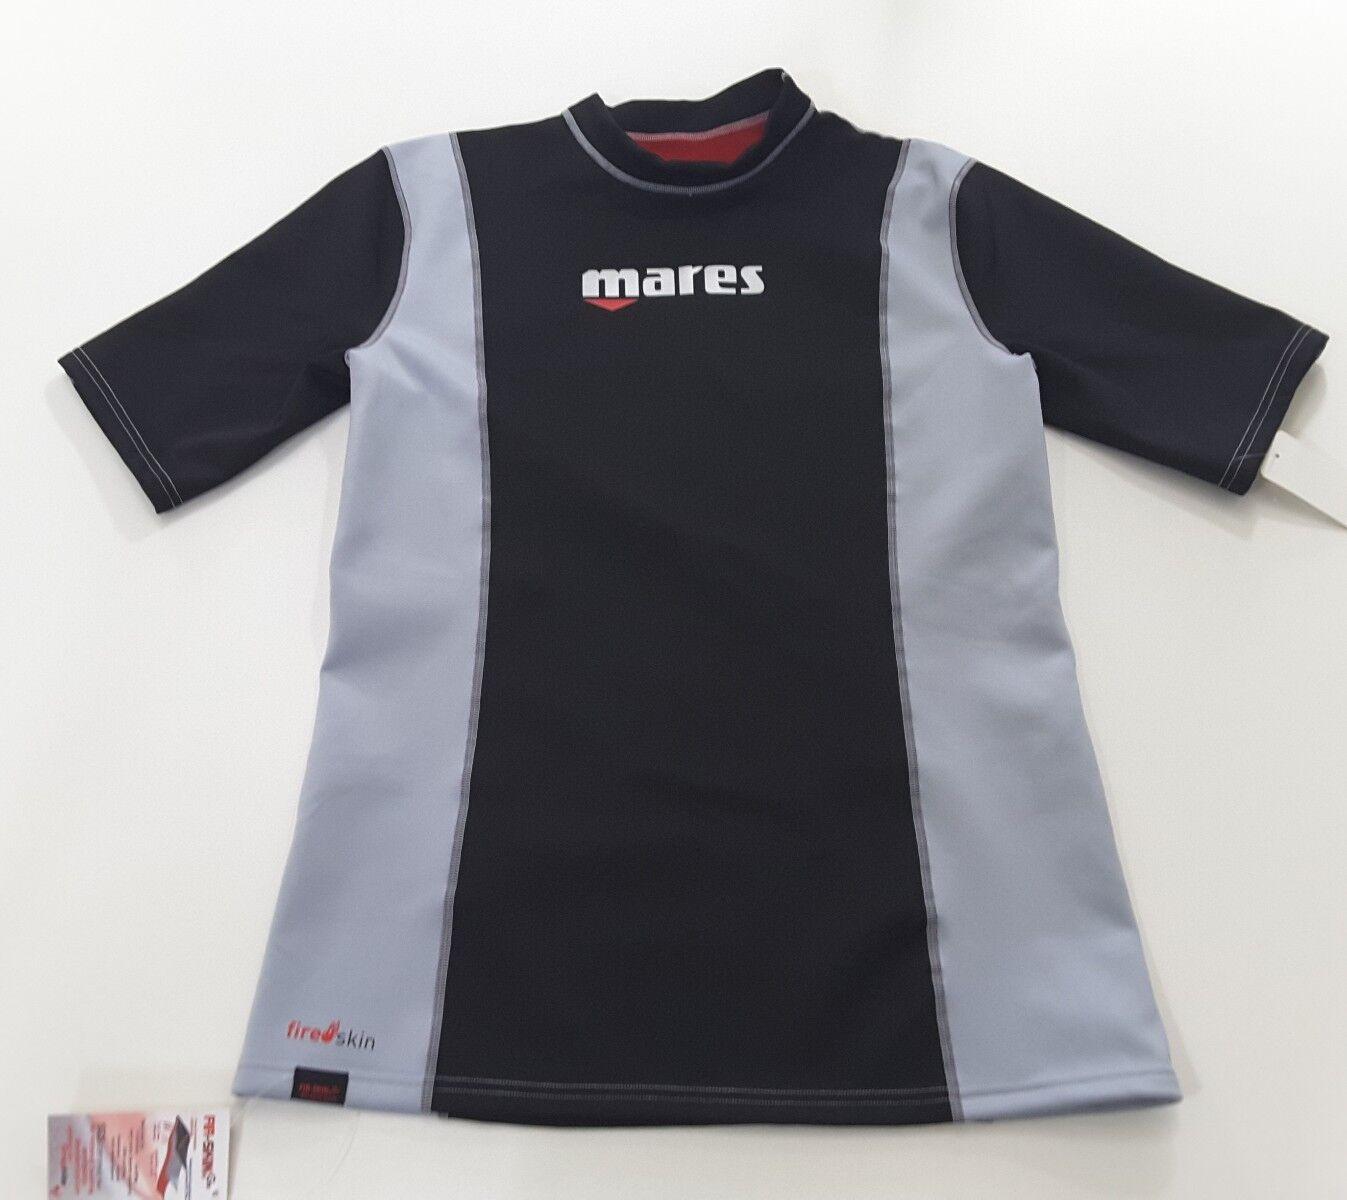 Mares  Fire Skin Fir-Skin Men's  llproof Windproof Watersport Guard Size XL  quality assurance